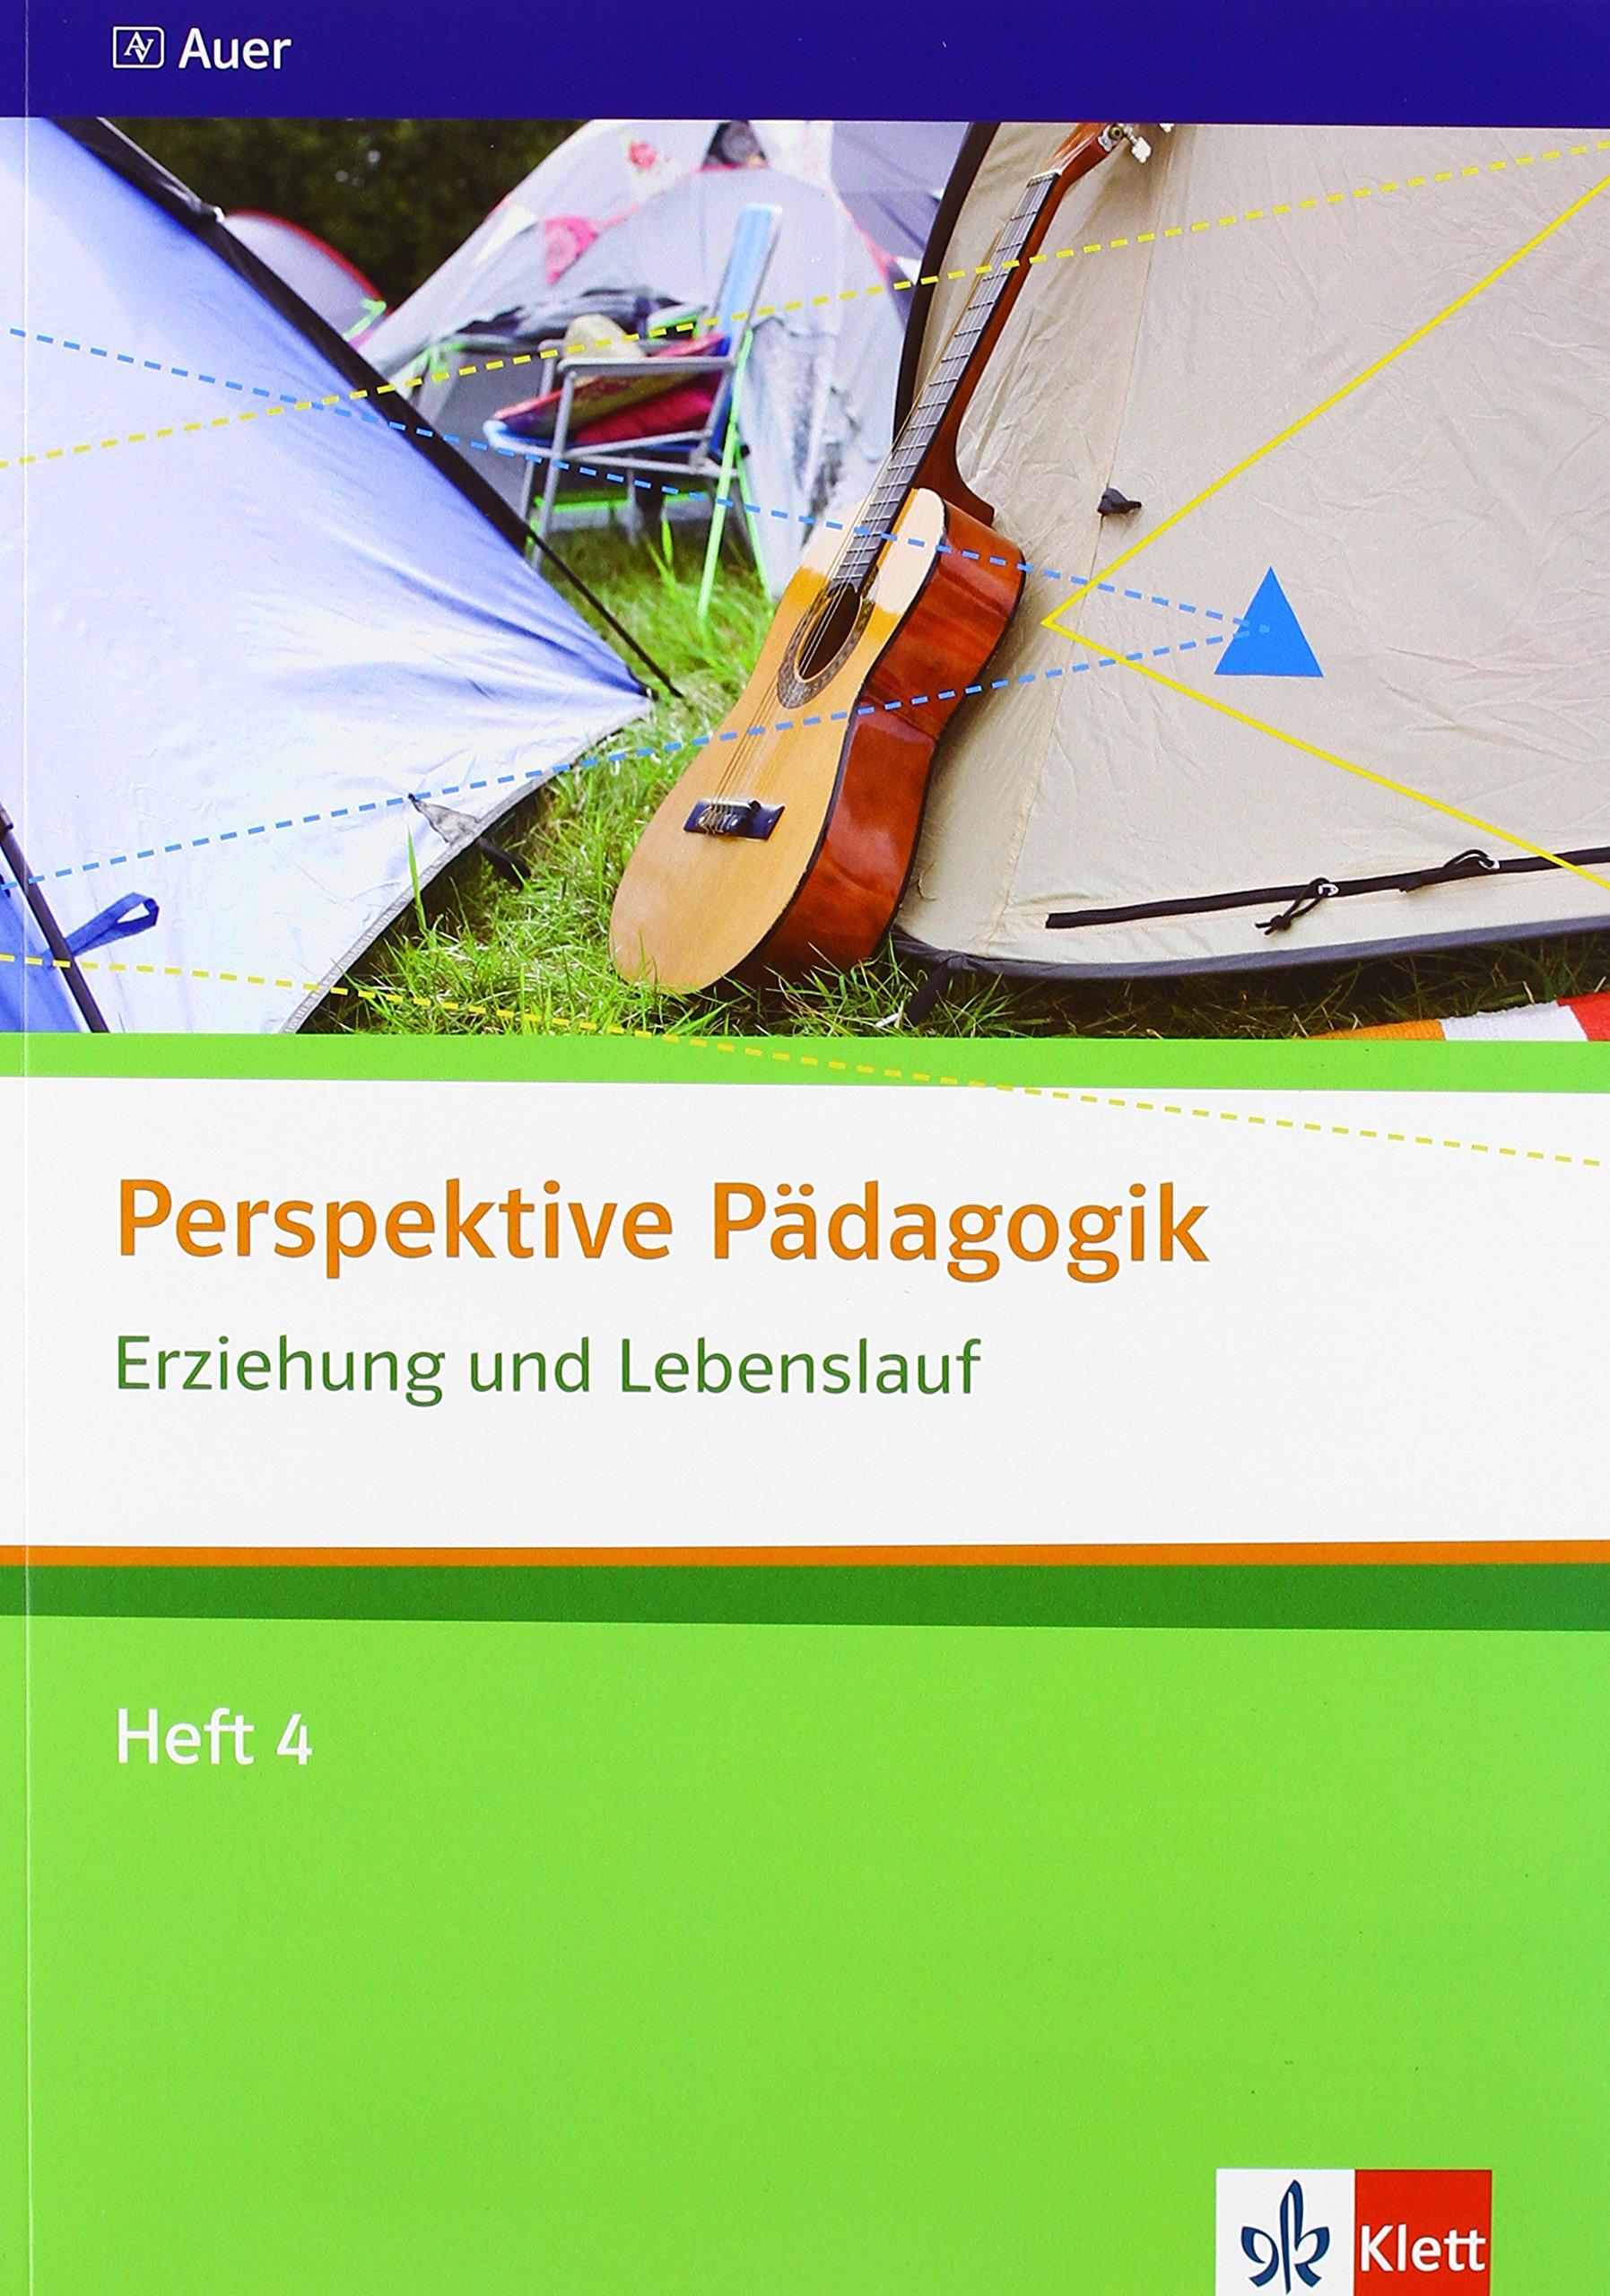 Perspektive Pädagogik / Erziehung und Lebenslauf: Oberstufe / Heft 4 ...